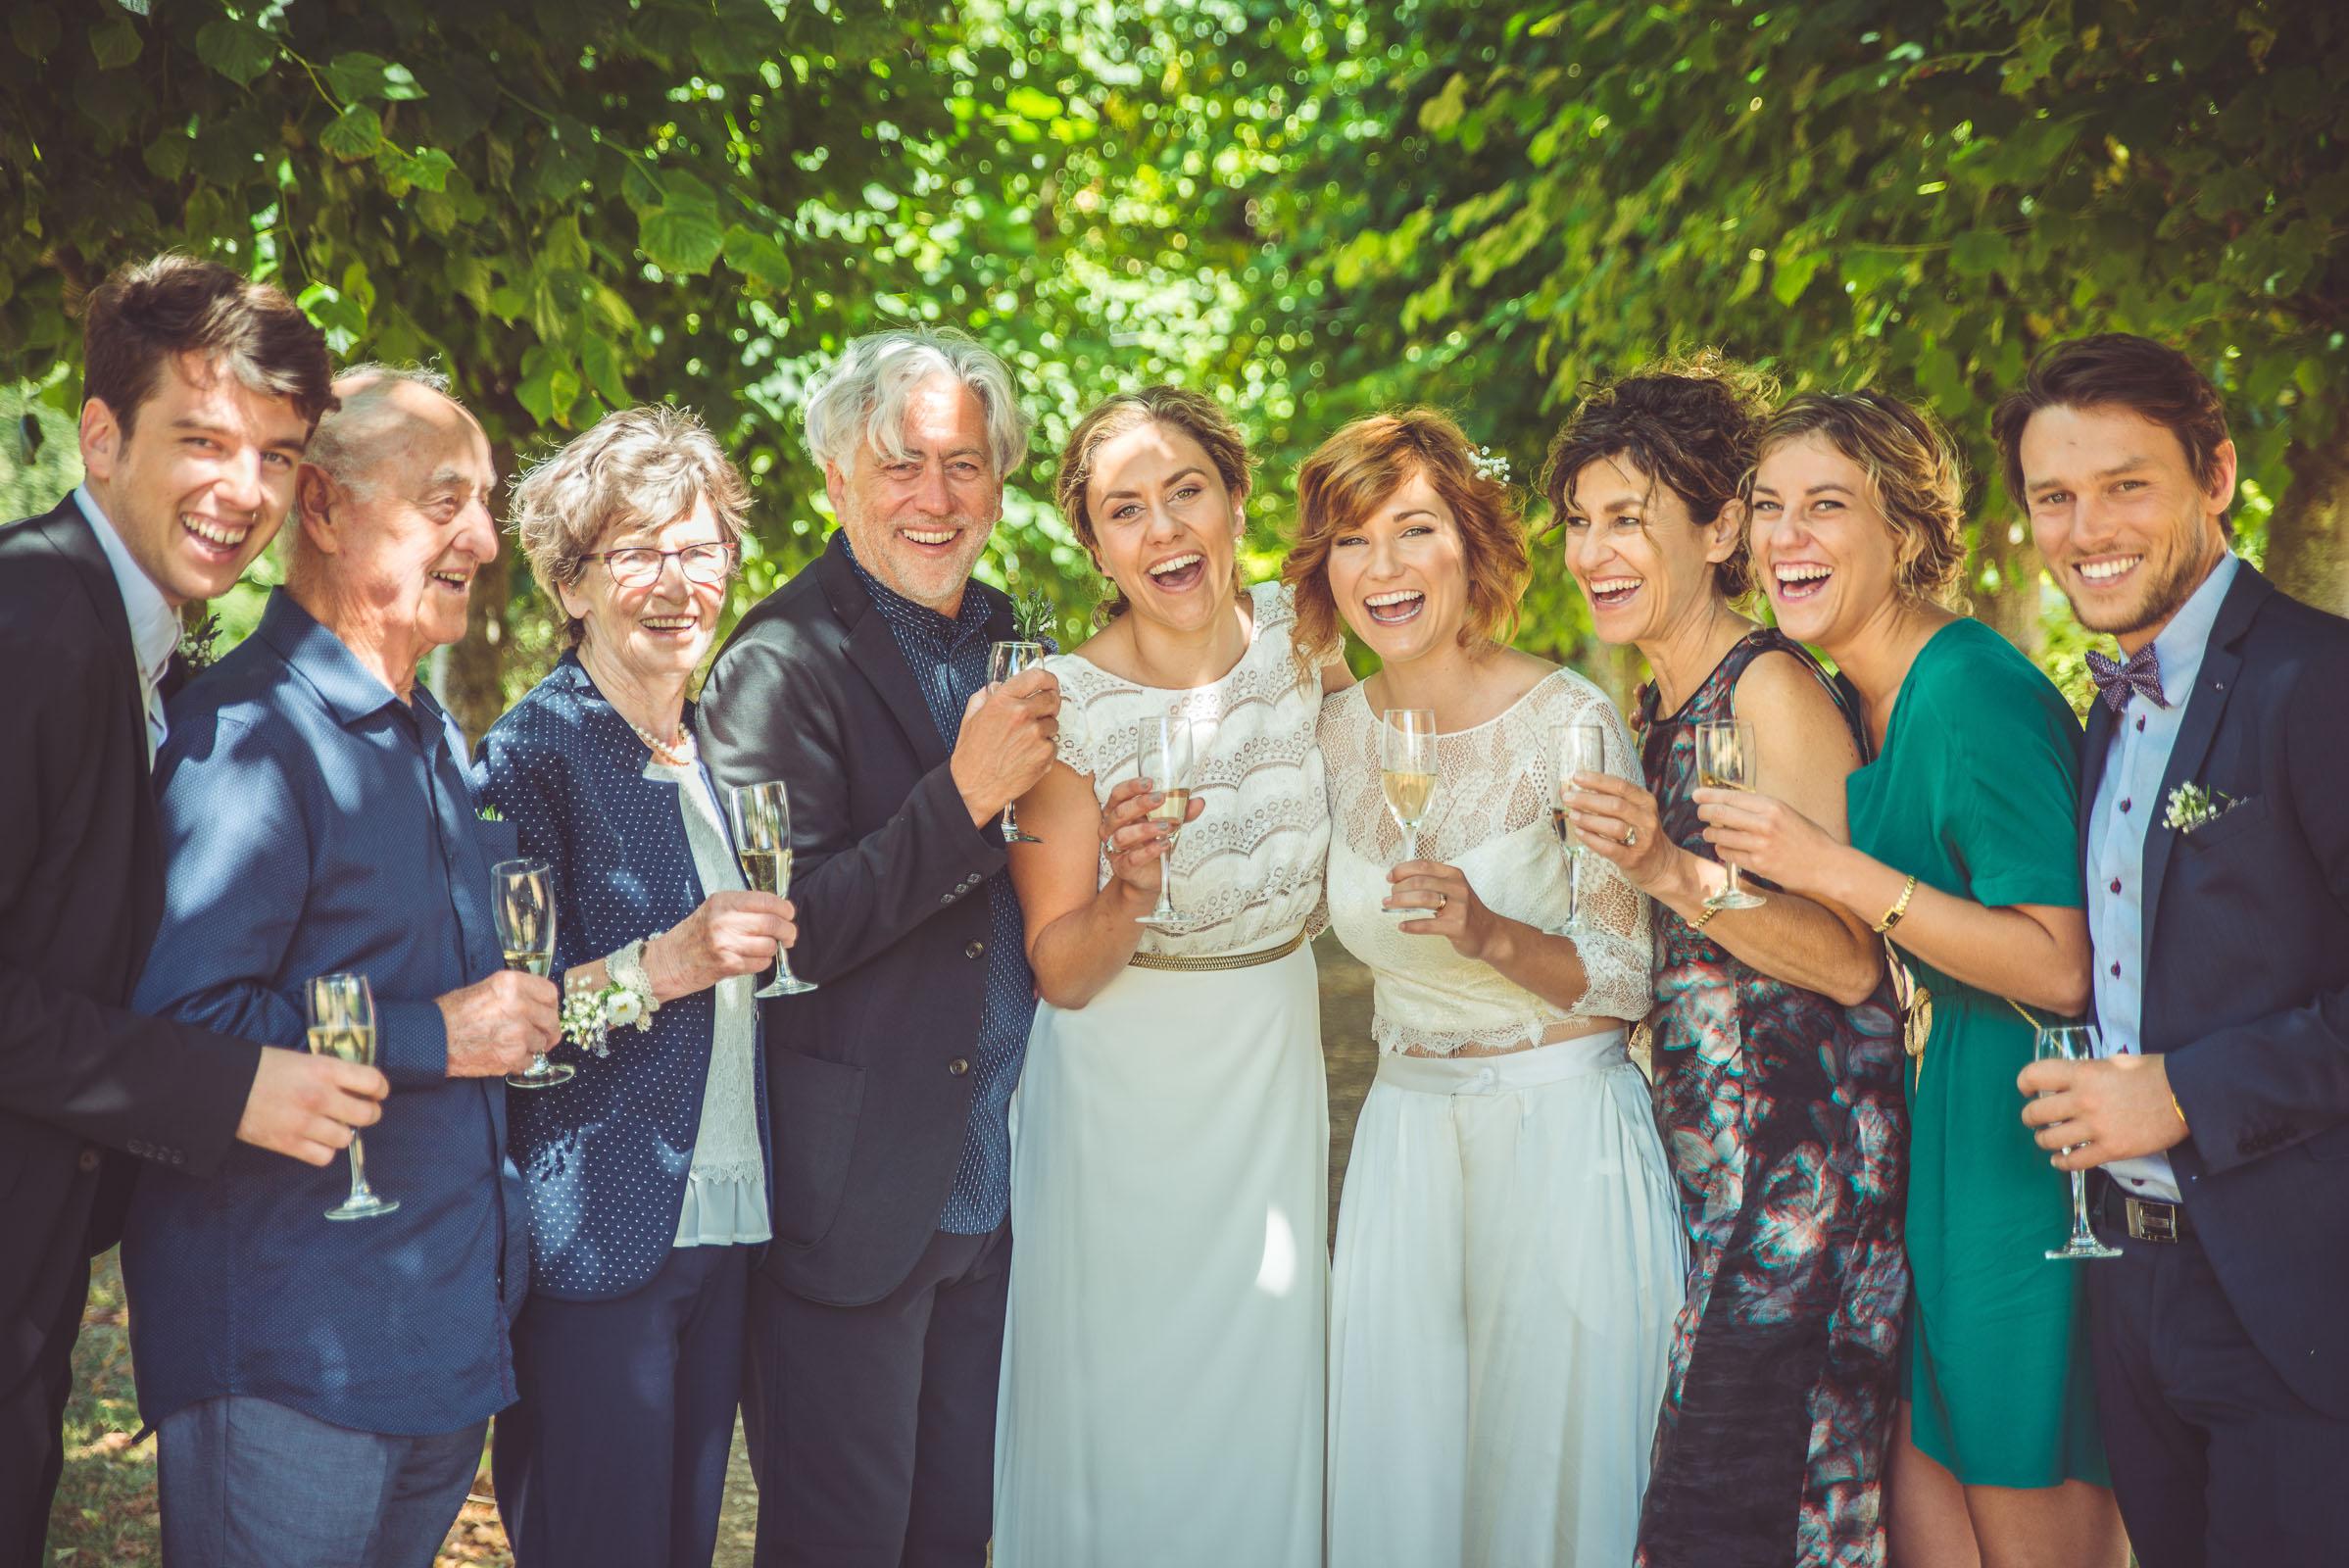 Hitchin_wedding_St_Pauls_Waldenbury_Royston_Wedding_Photographer-19.jpg